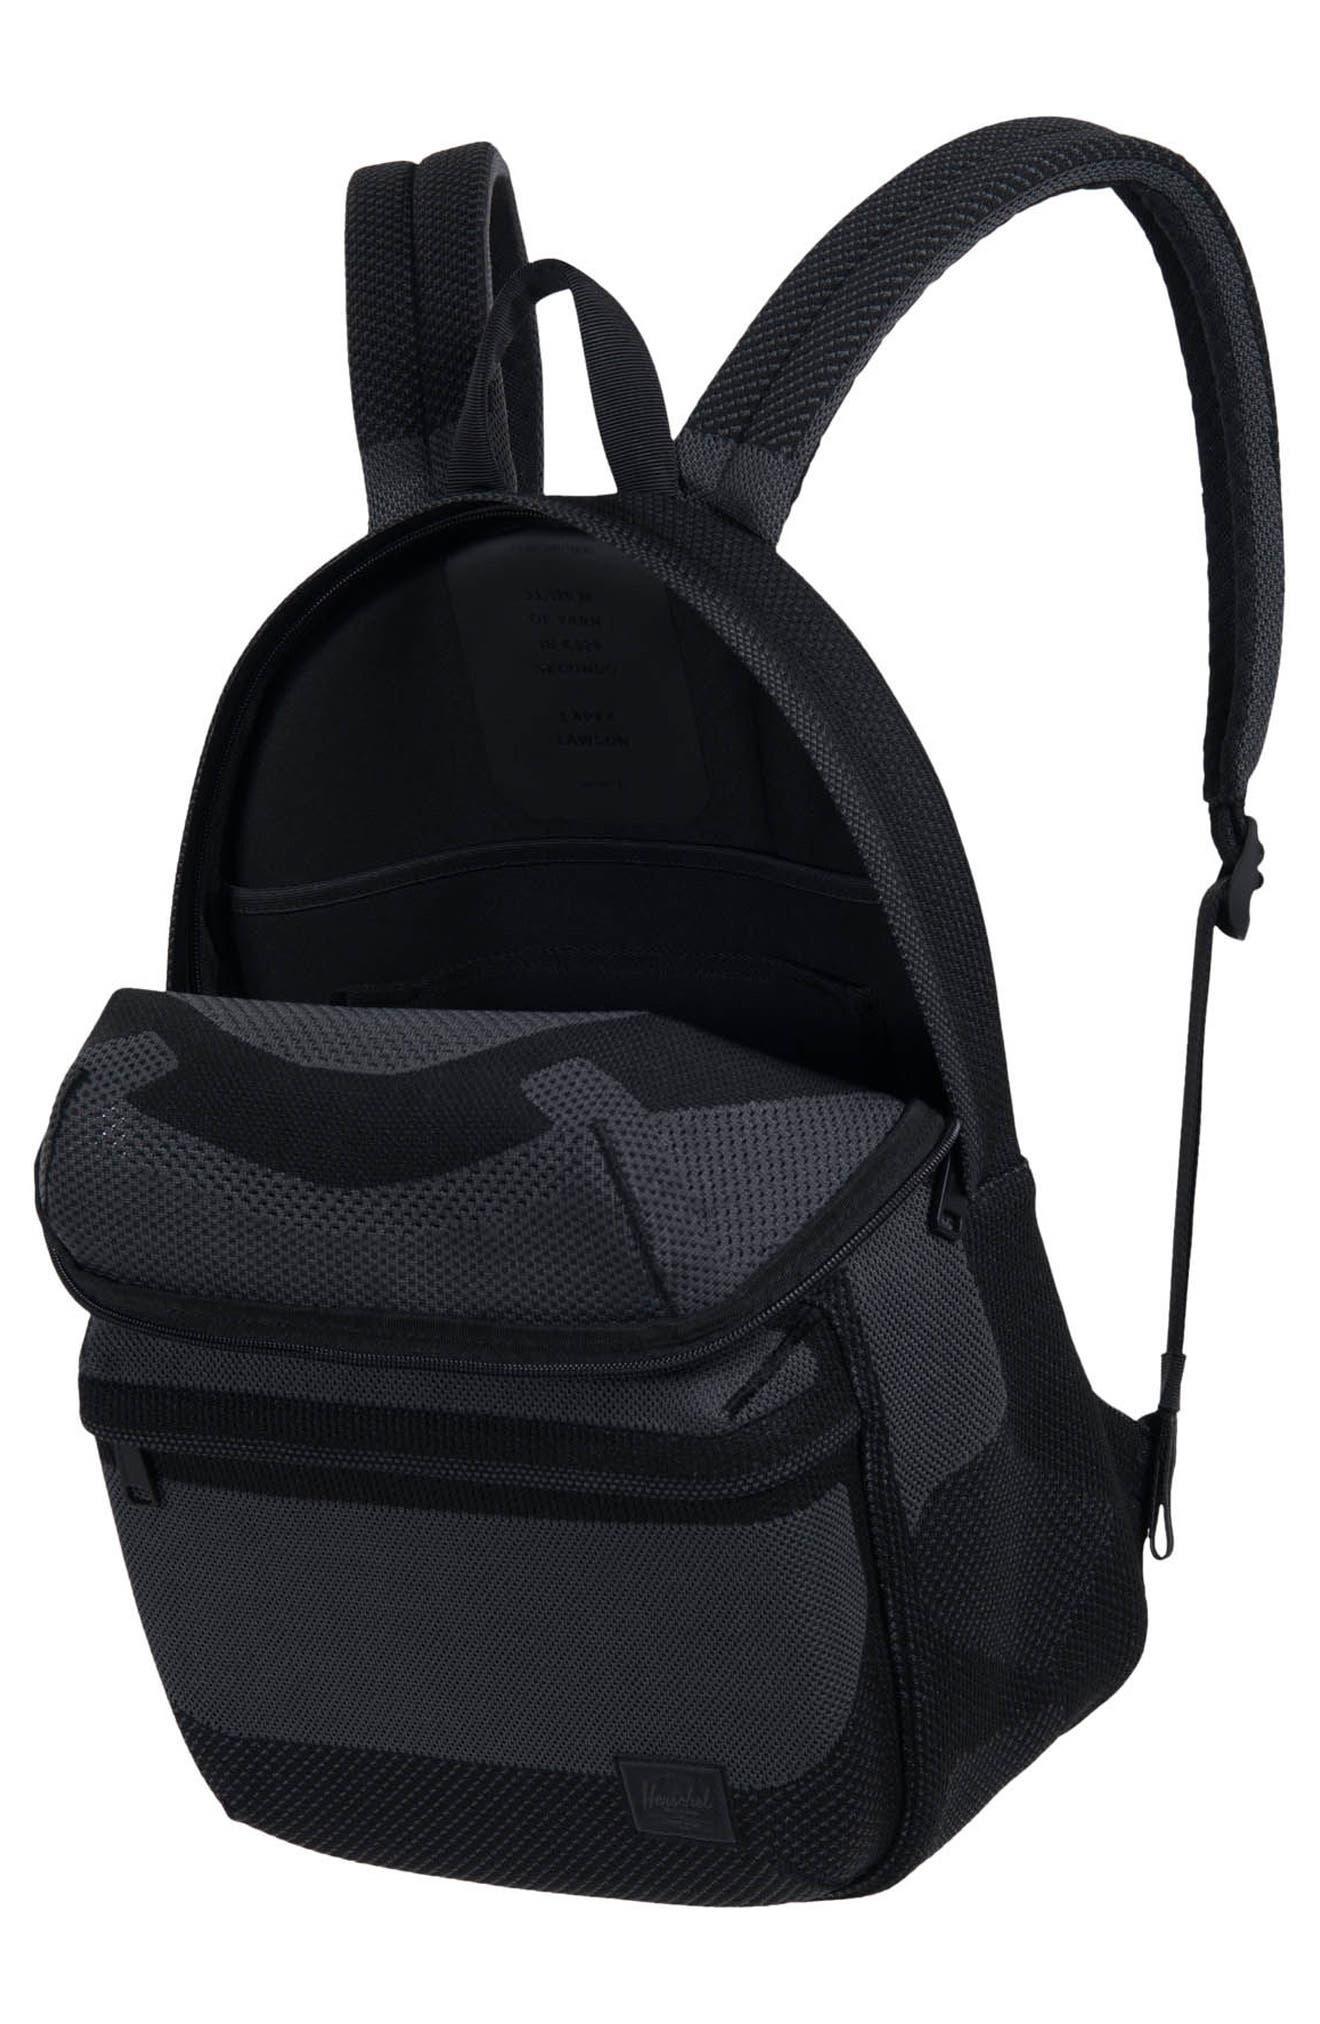 Apex Lawson Backpack,                             Alternate thumbnail 3, color,                             Black Beauty/ Dark Shadow